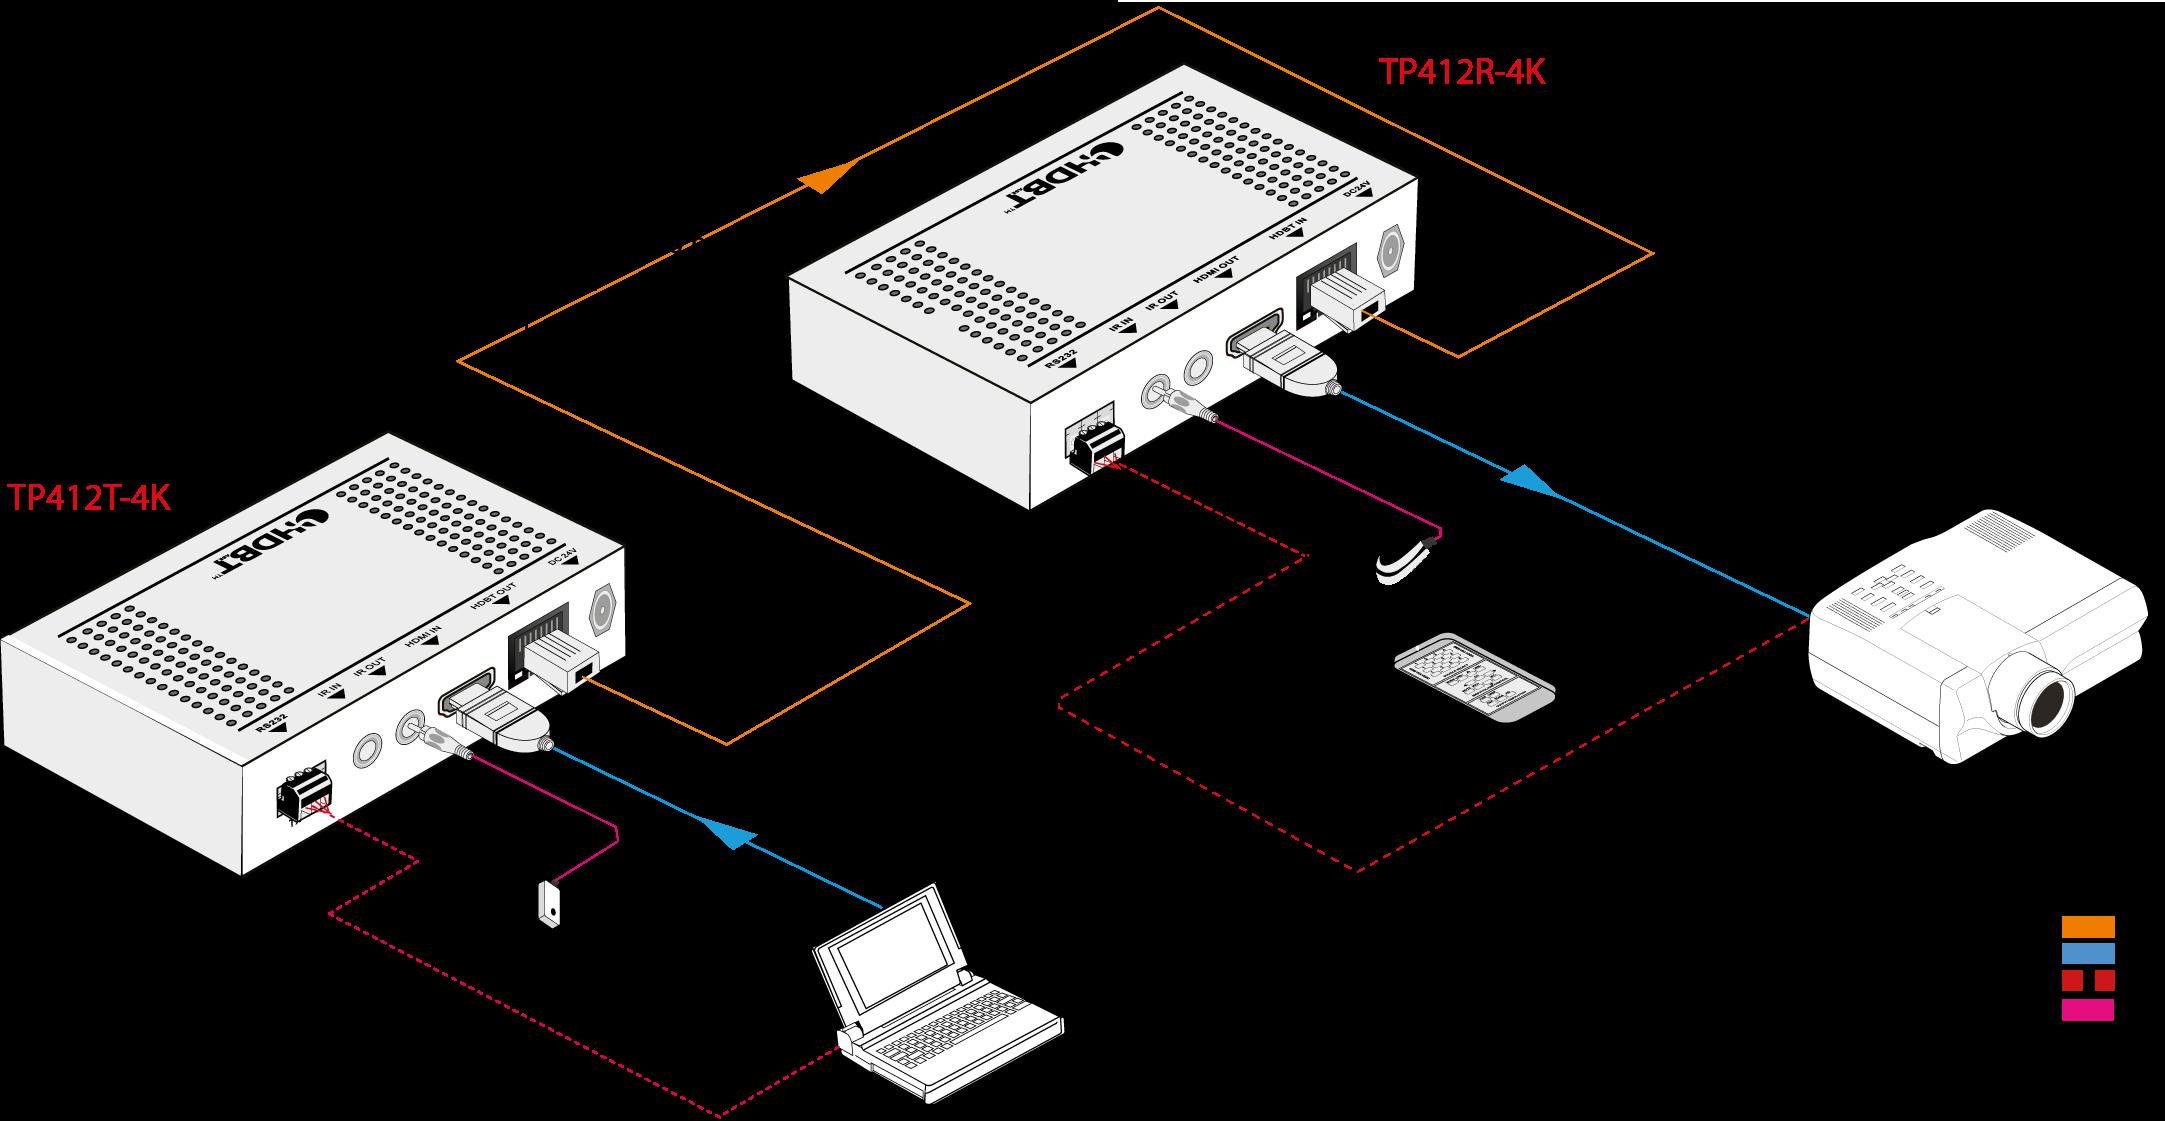 TP412P-4K | Kit extendeur HDMI HDBT 4K 70m POC ultra fin